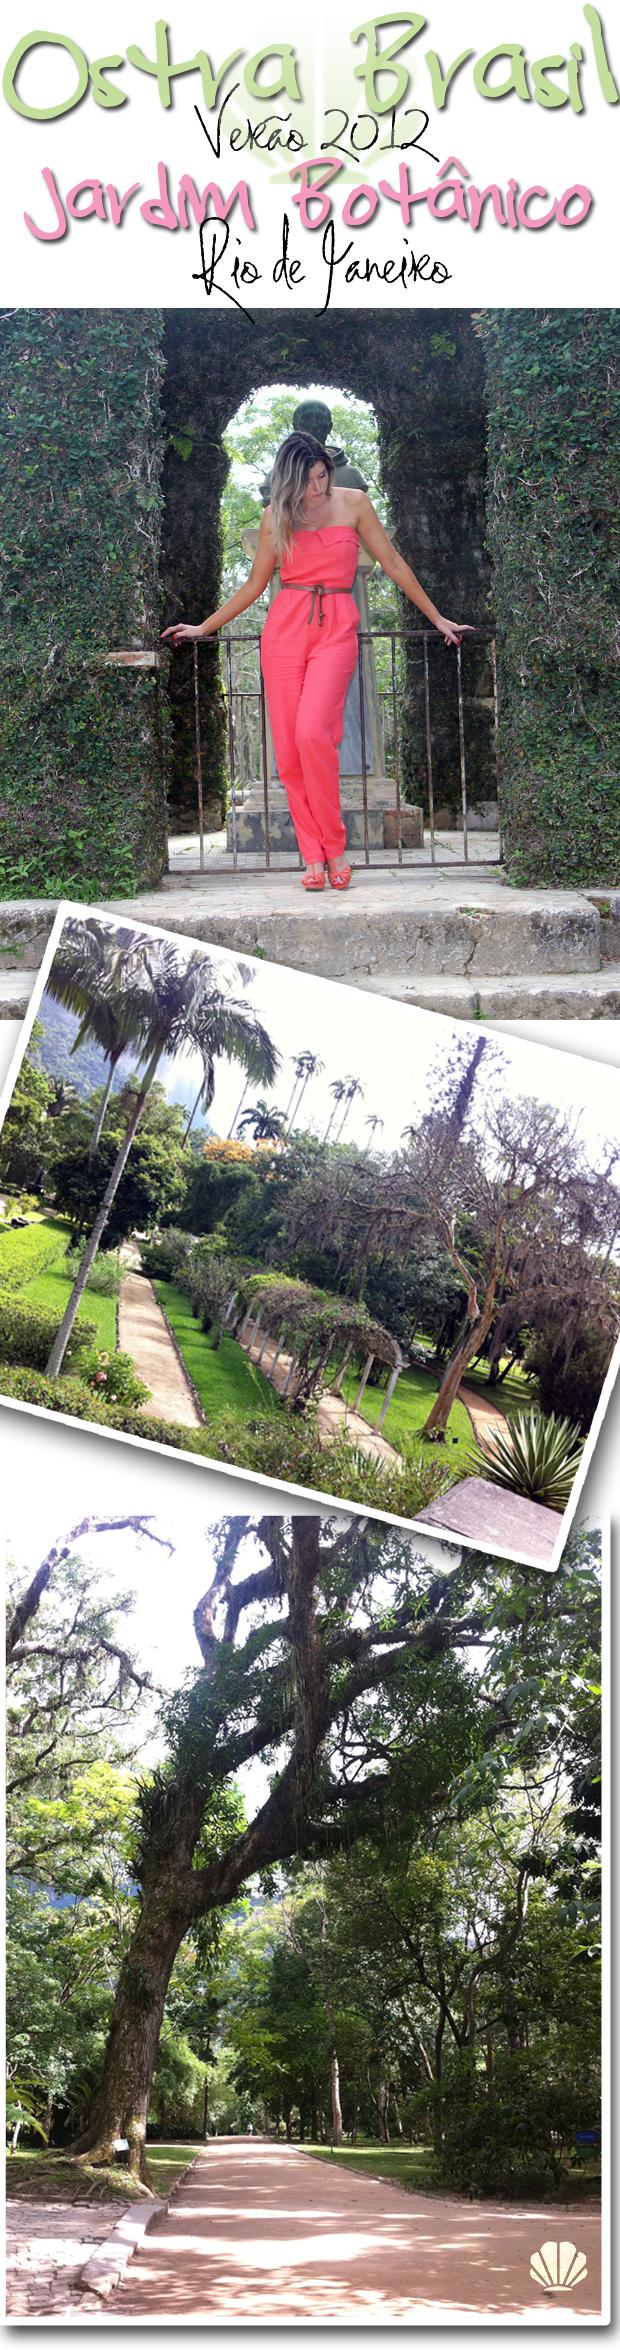 Jardim Botanico – RJ em http://www.ostrabrasil.com.br/blog